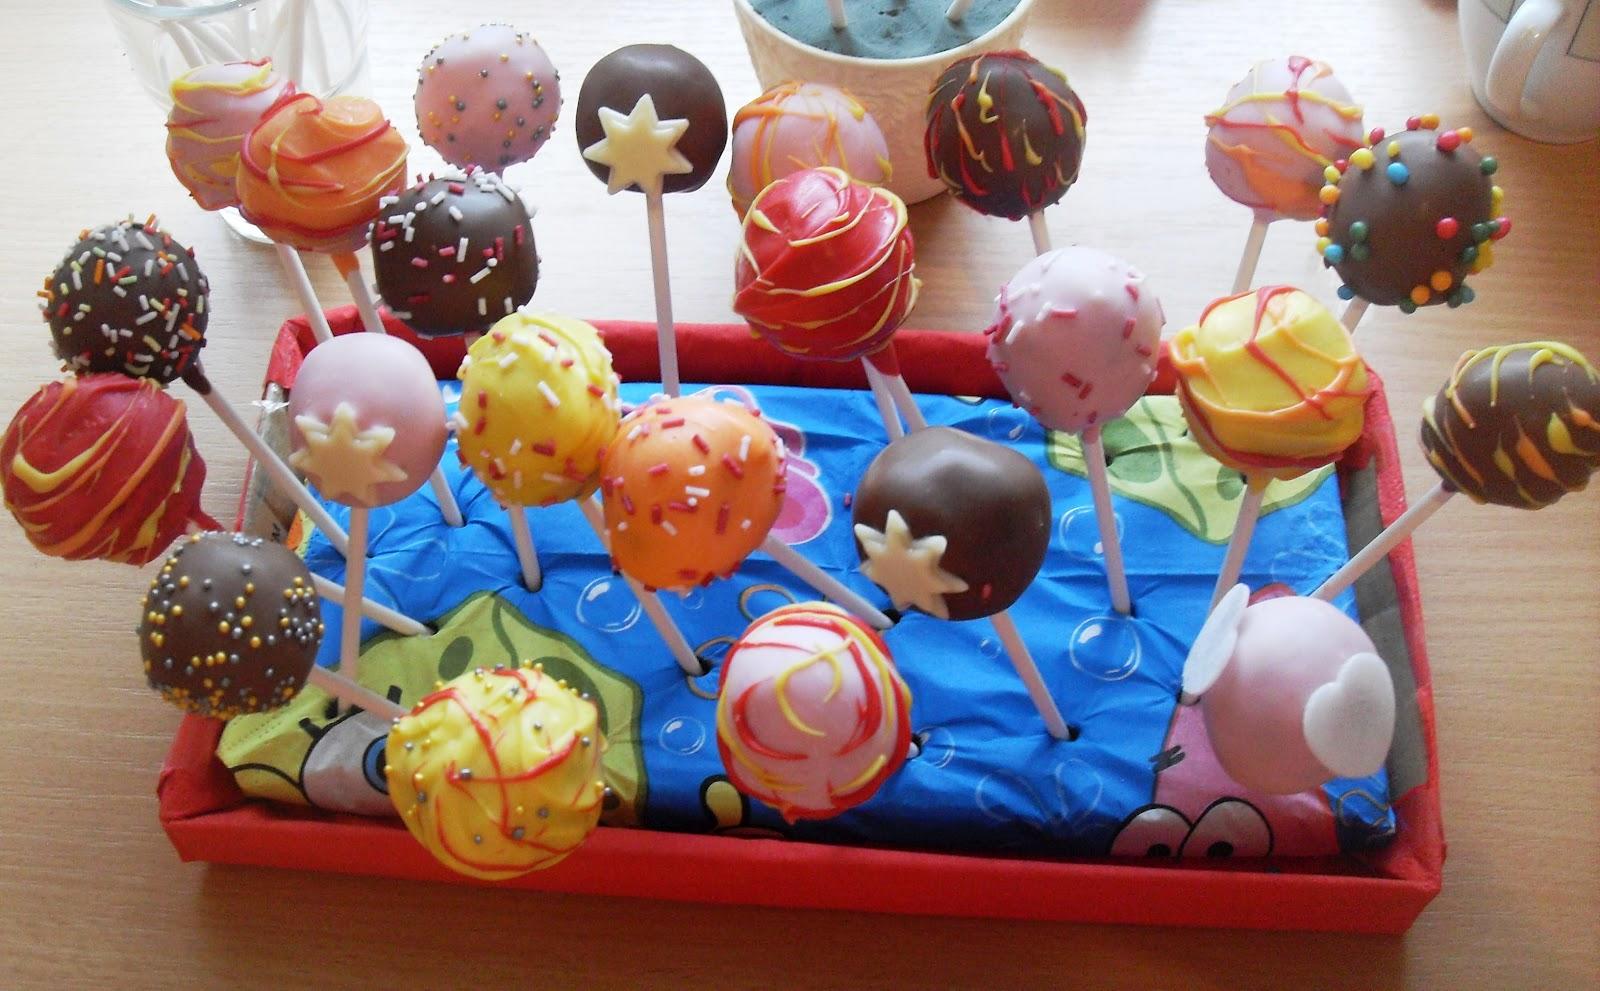 Cake Pops Ohne Backen Mit Frischkse Cakepops Grundrezept